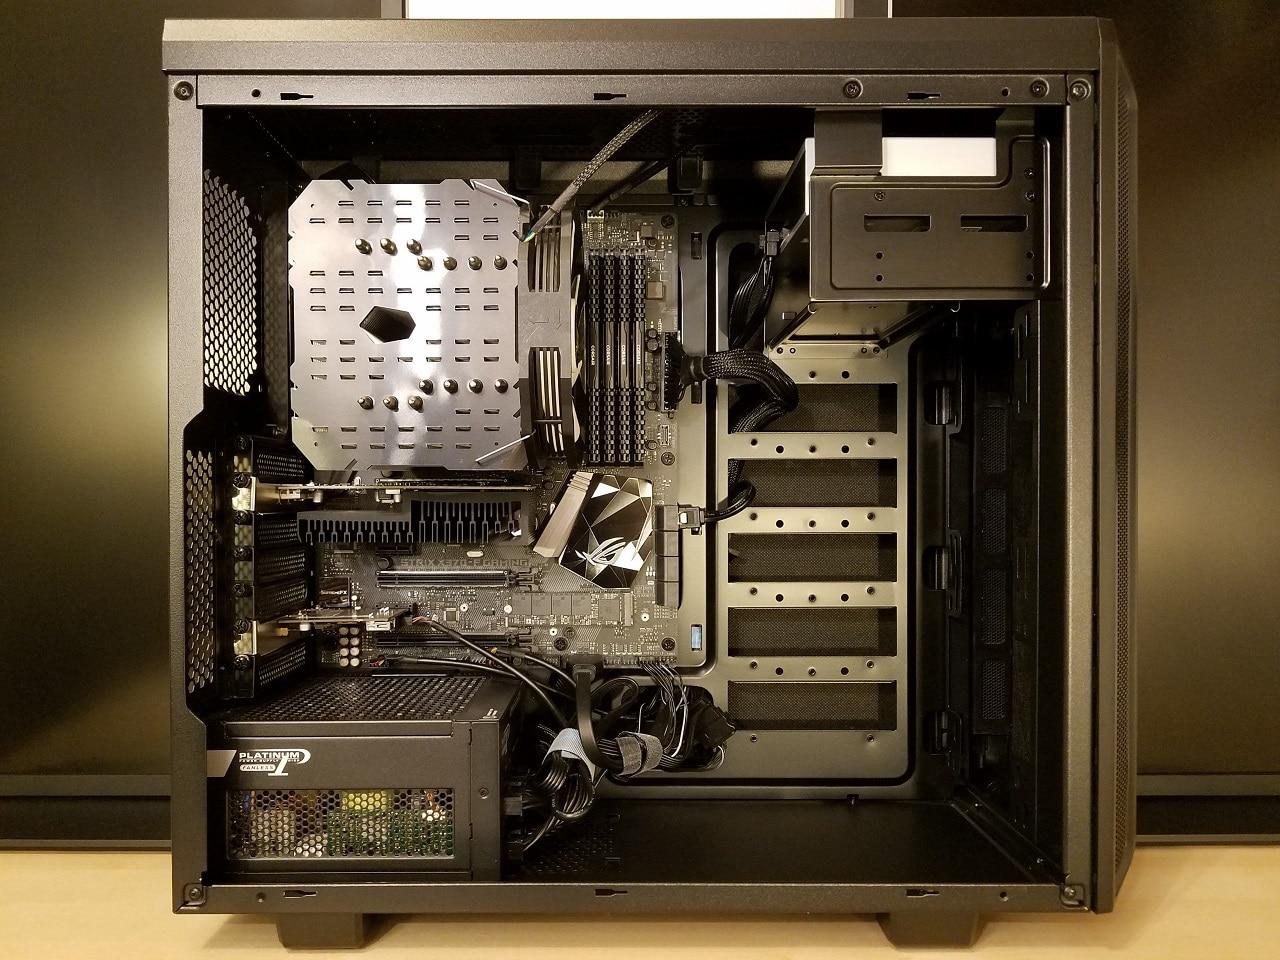 pc case image